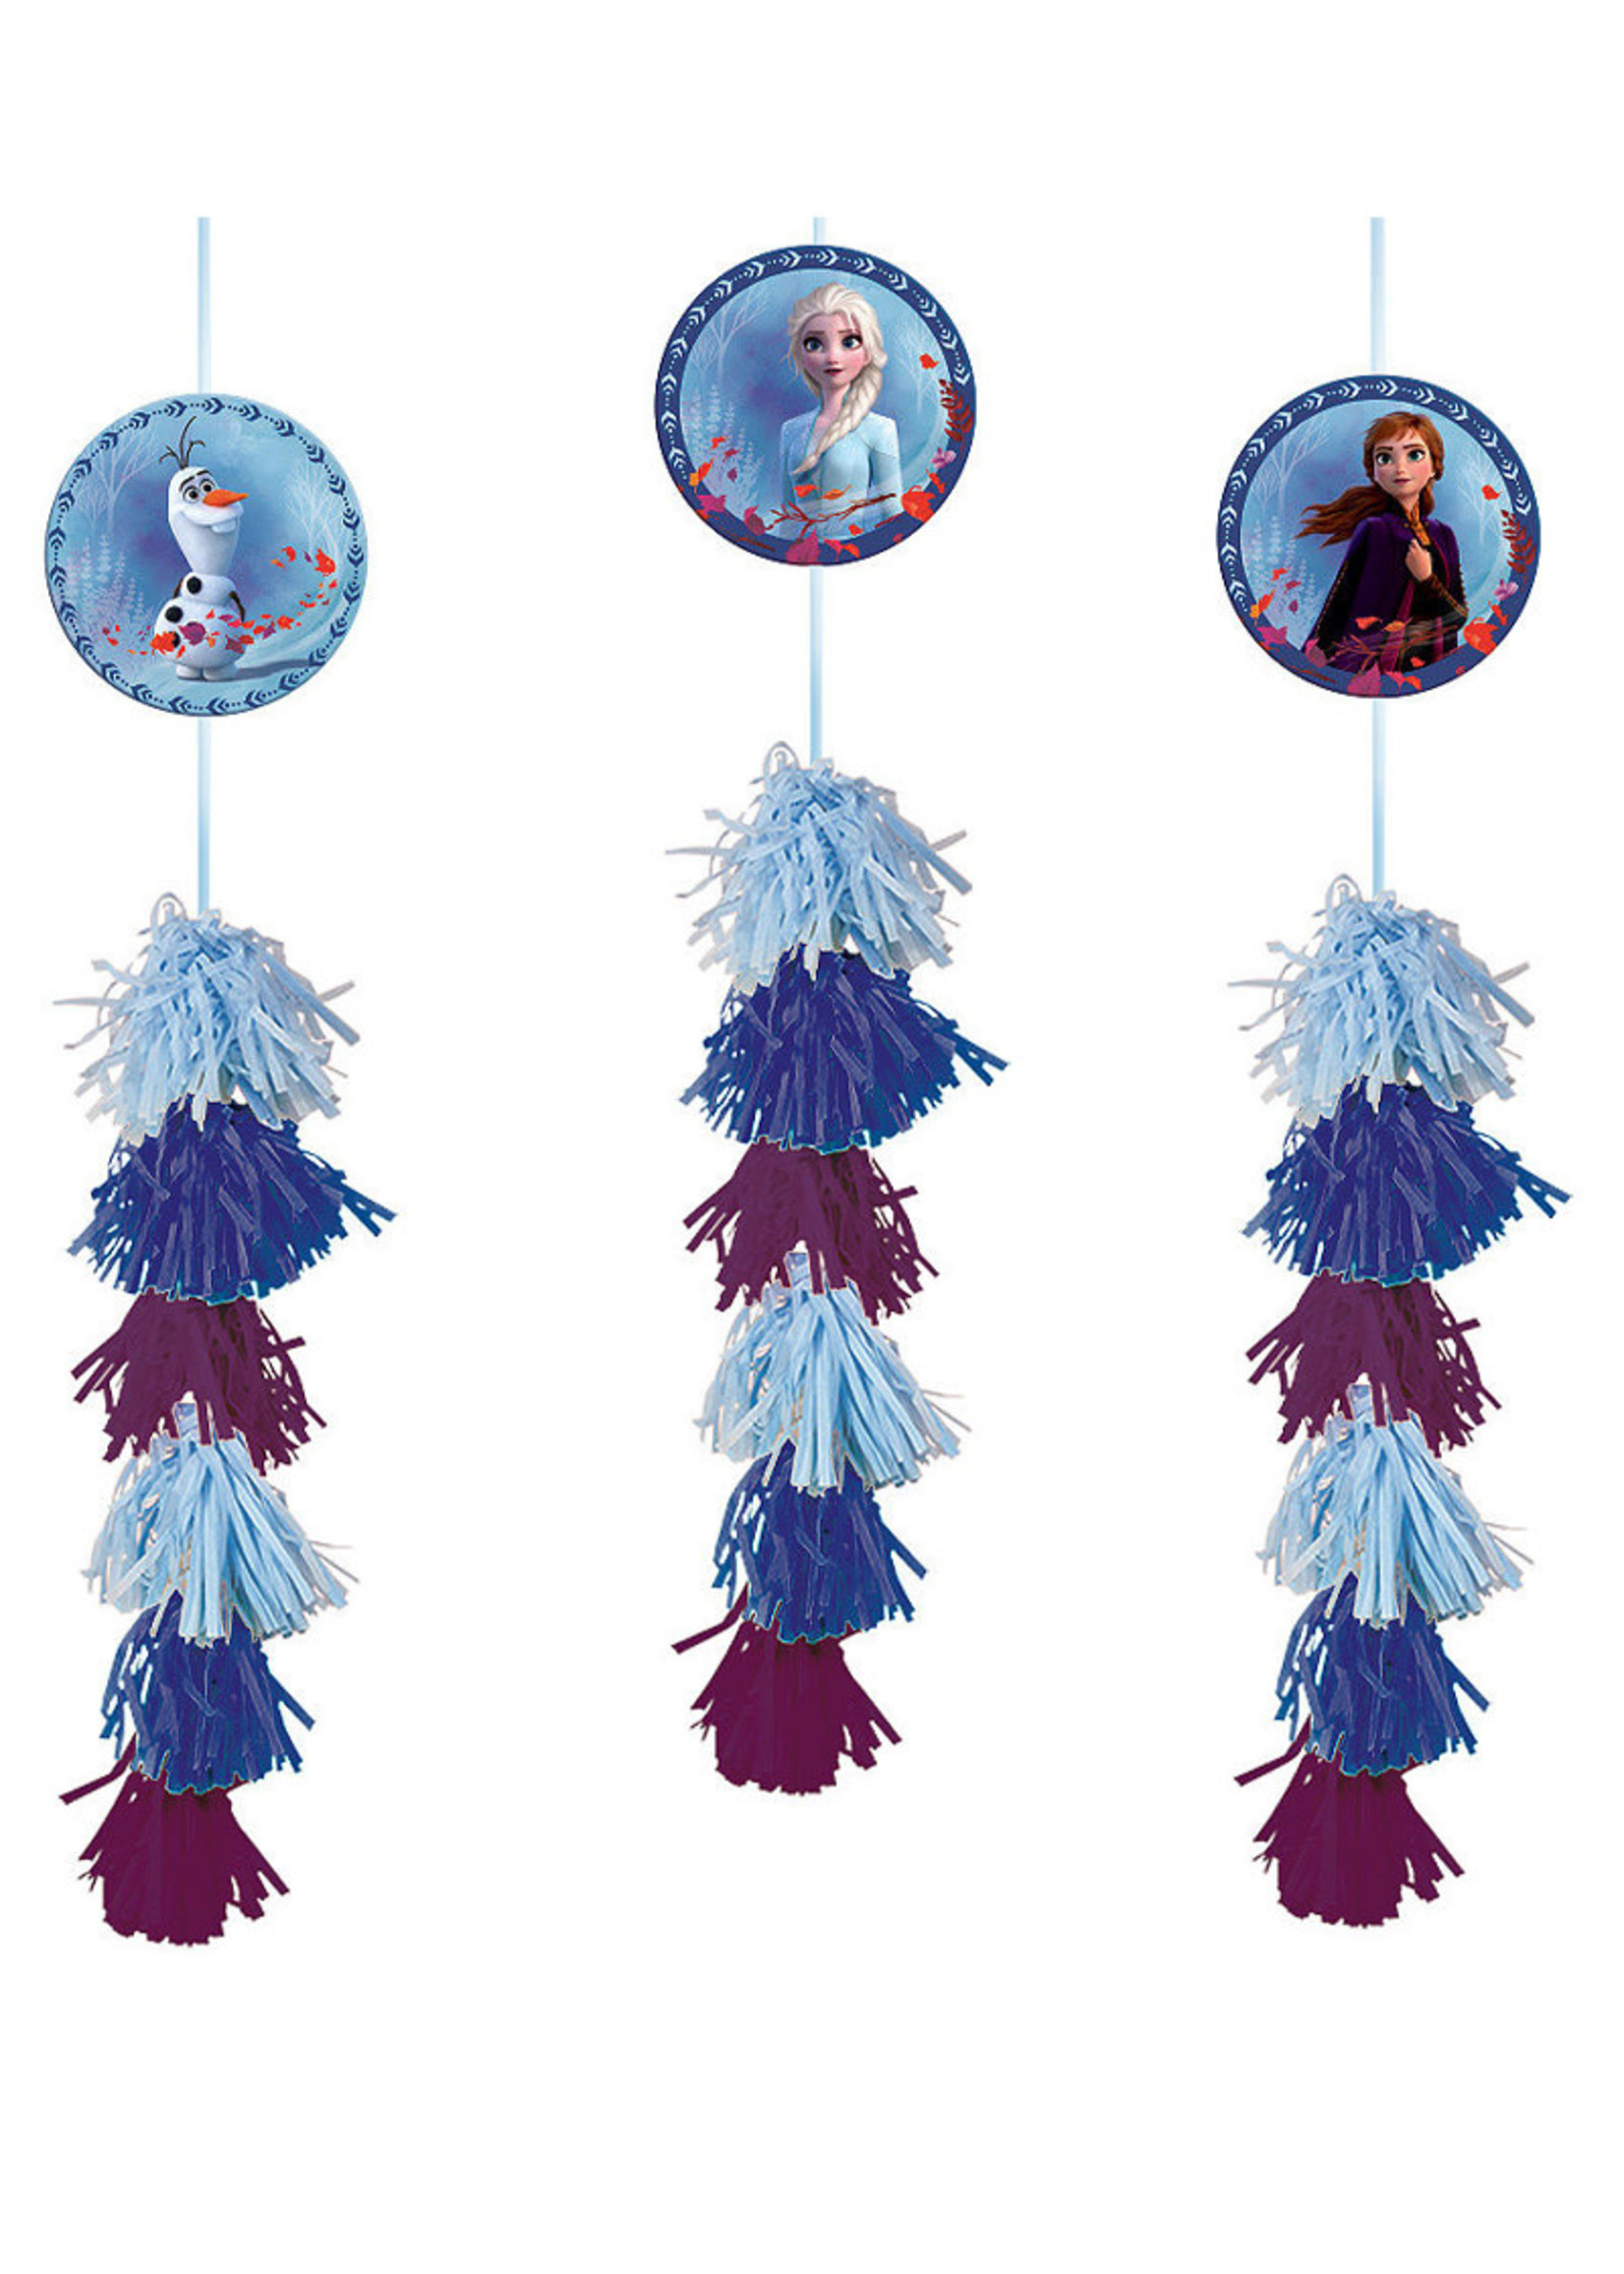 Disney Frozen Tassel Decorations - 3ct